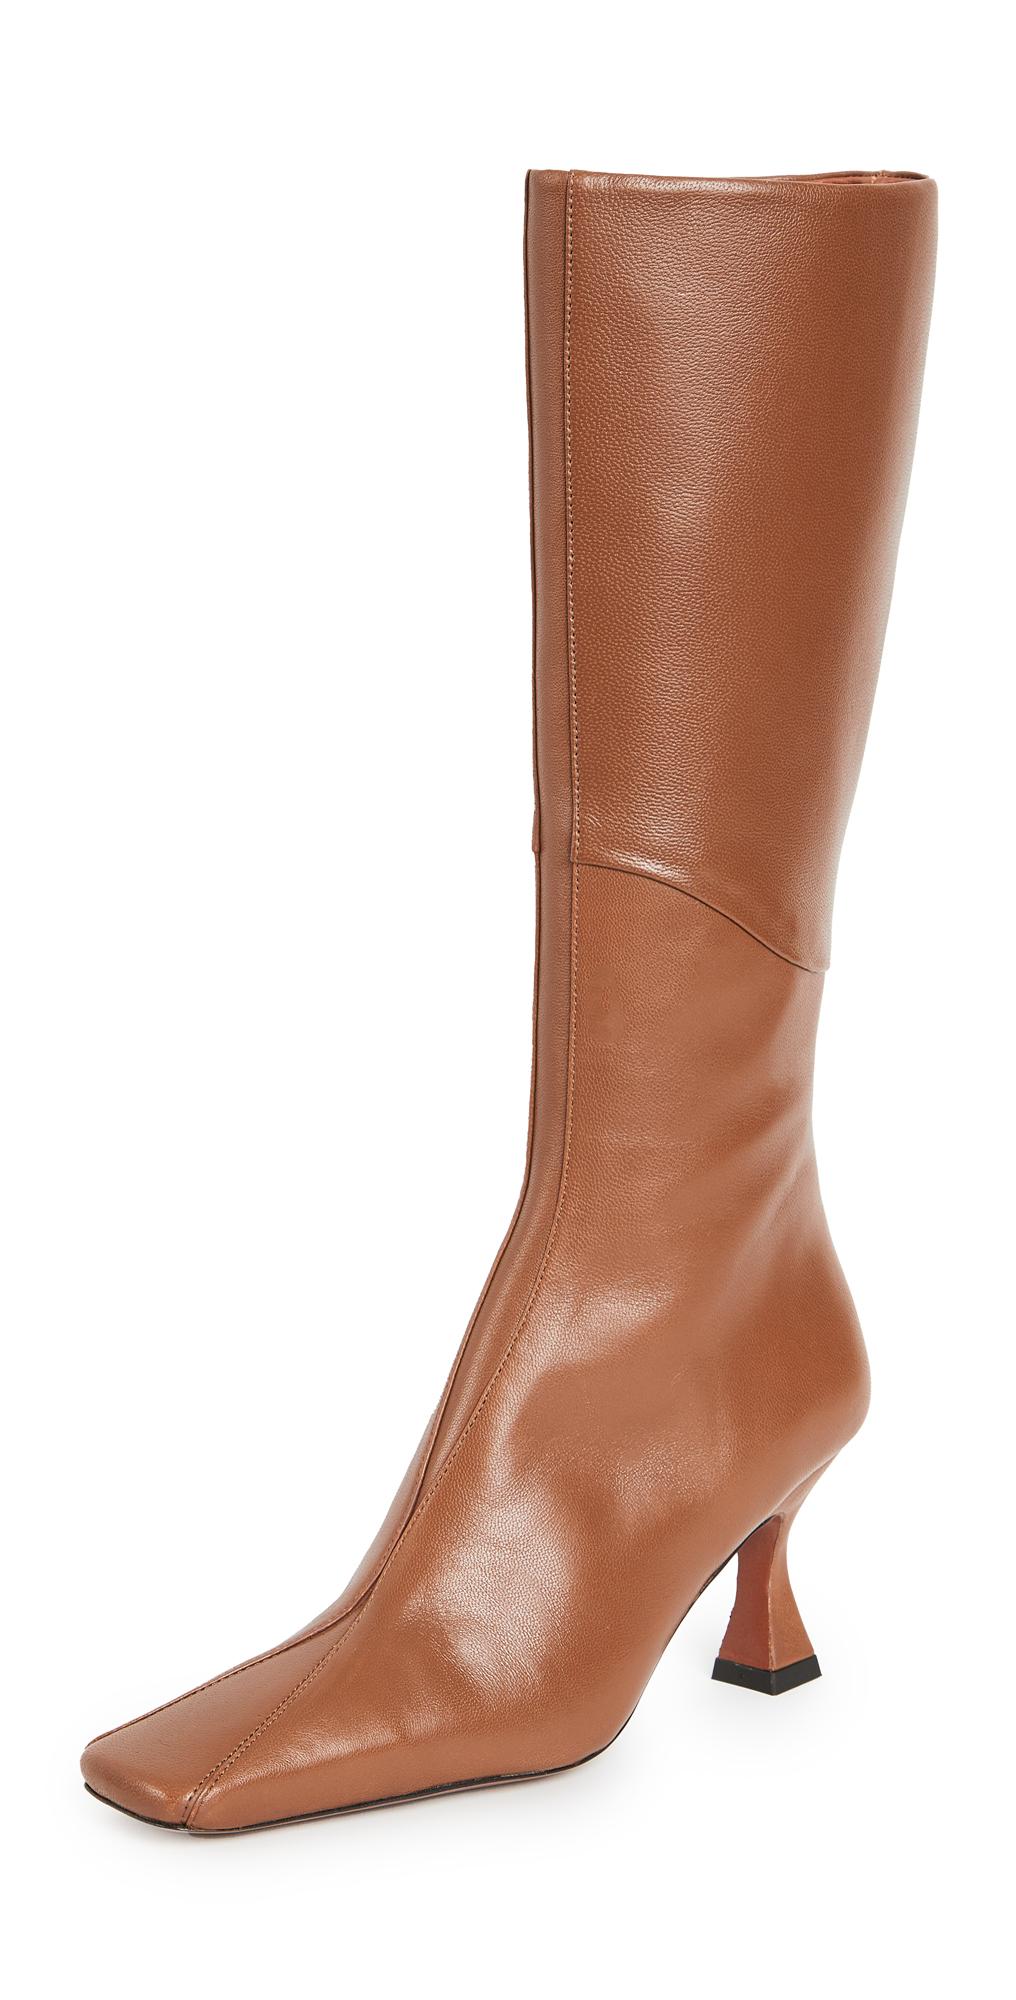 MANU Atelier Knee High Multipanel XX Duck Boots